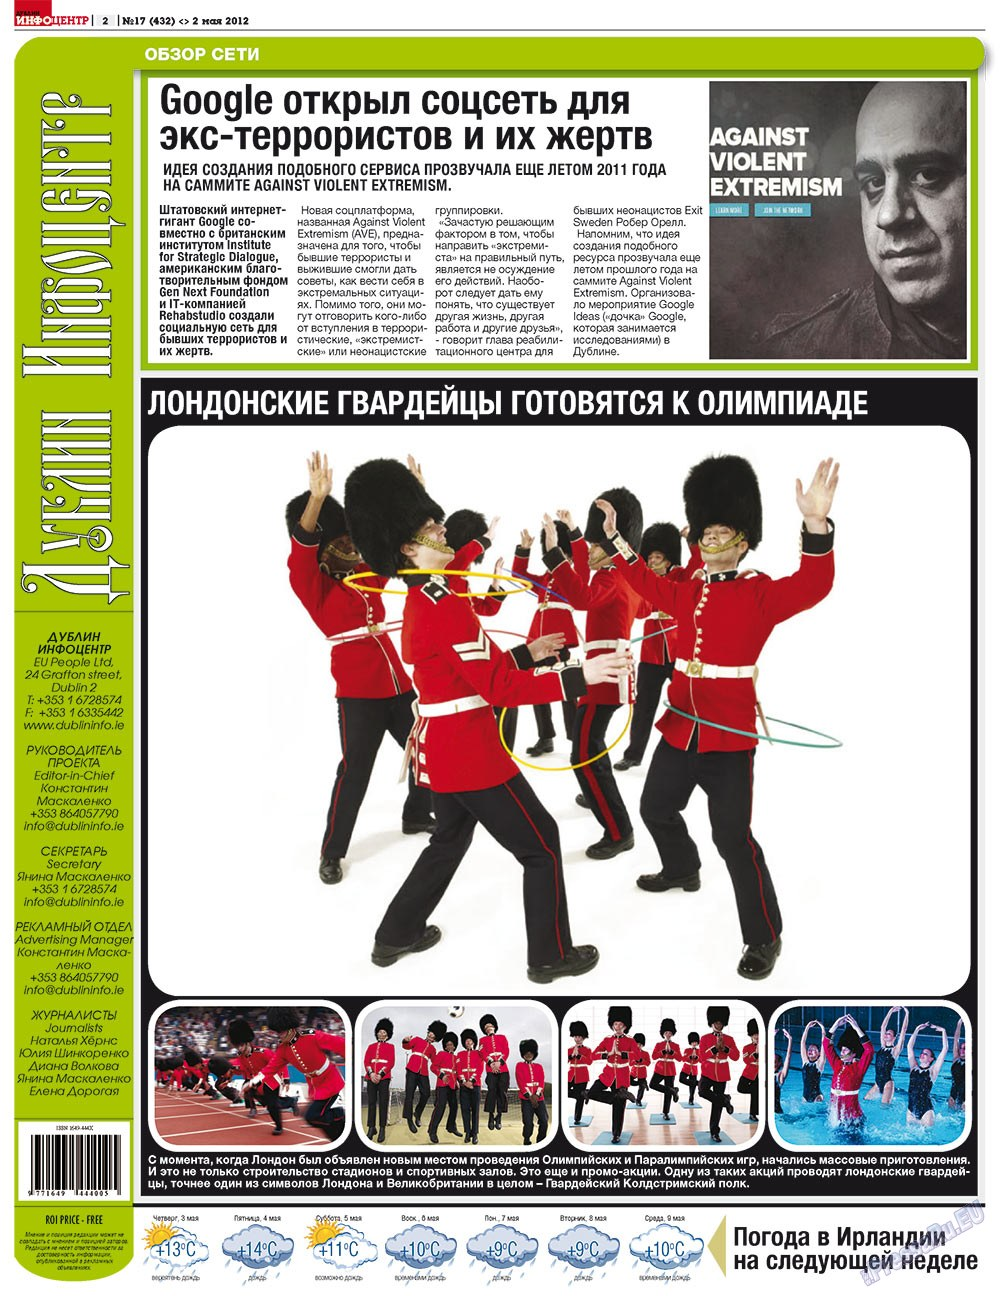 Дублин инфоцентр (газета). 2012 год, номер 17, стр. 2